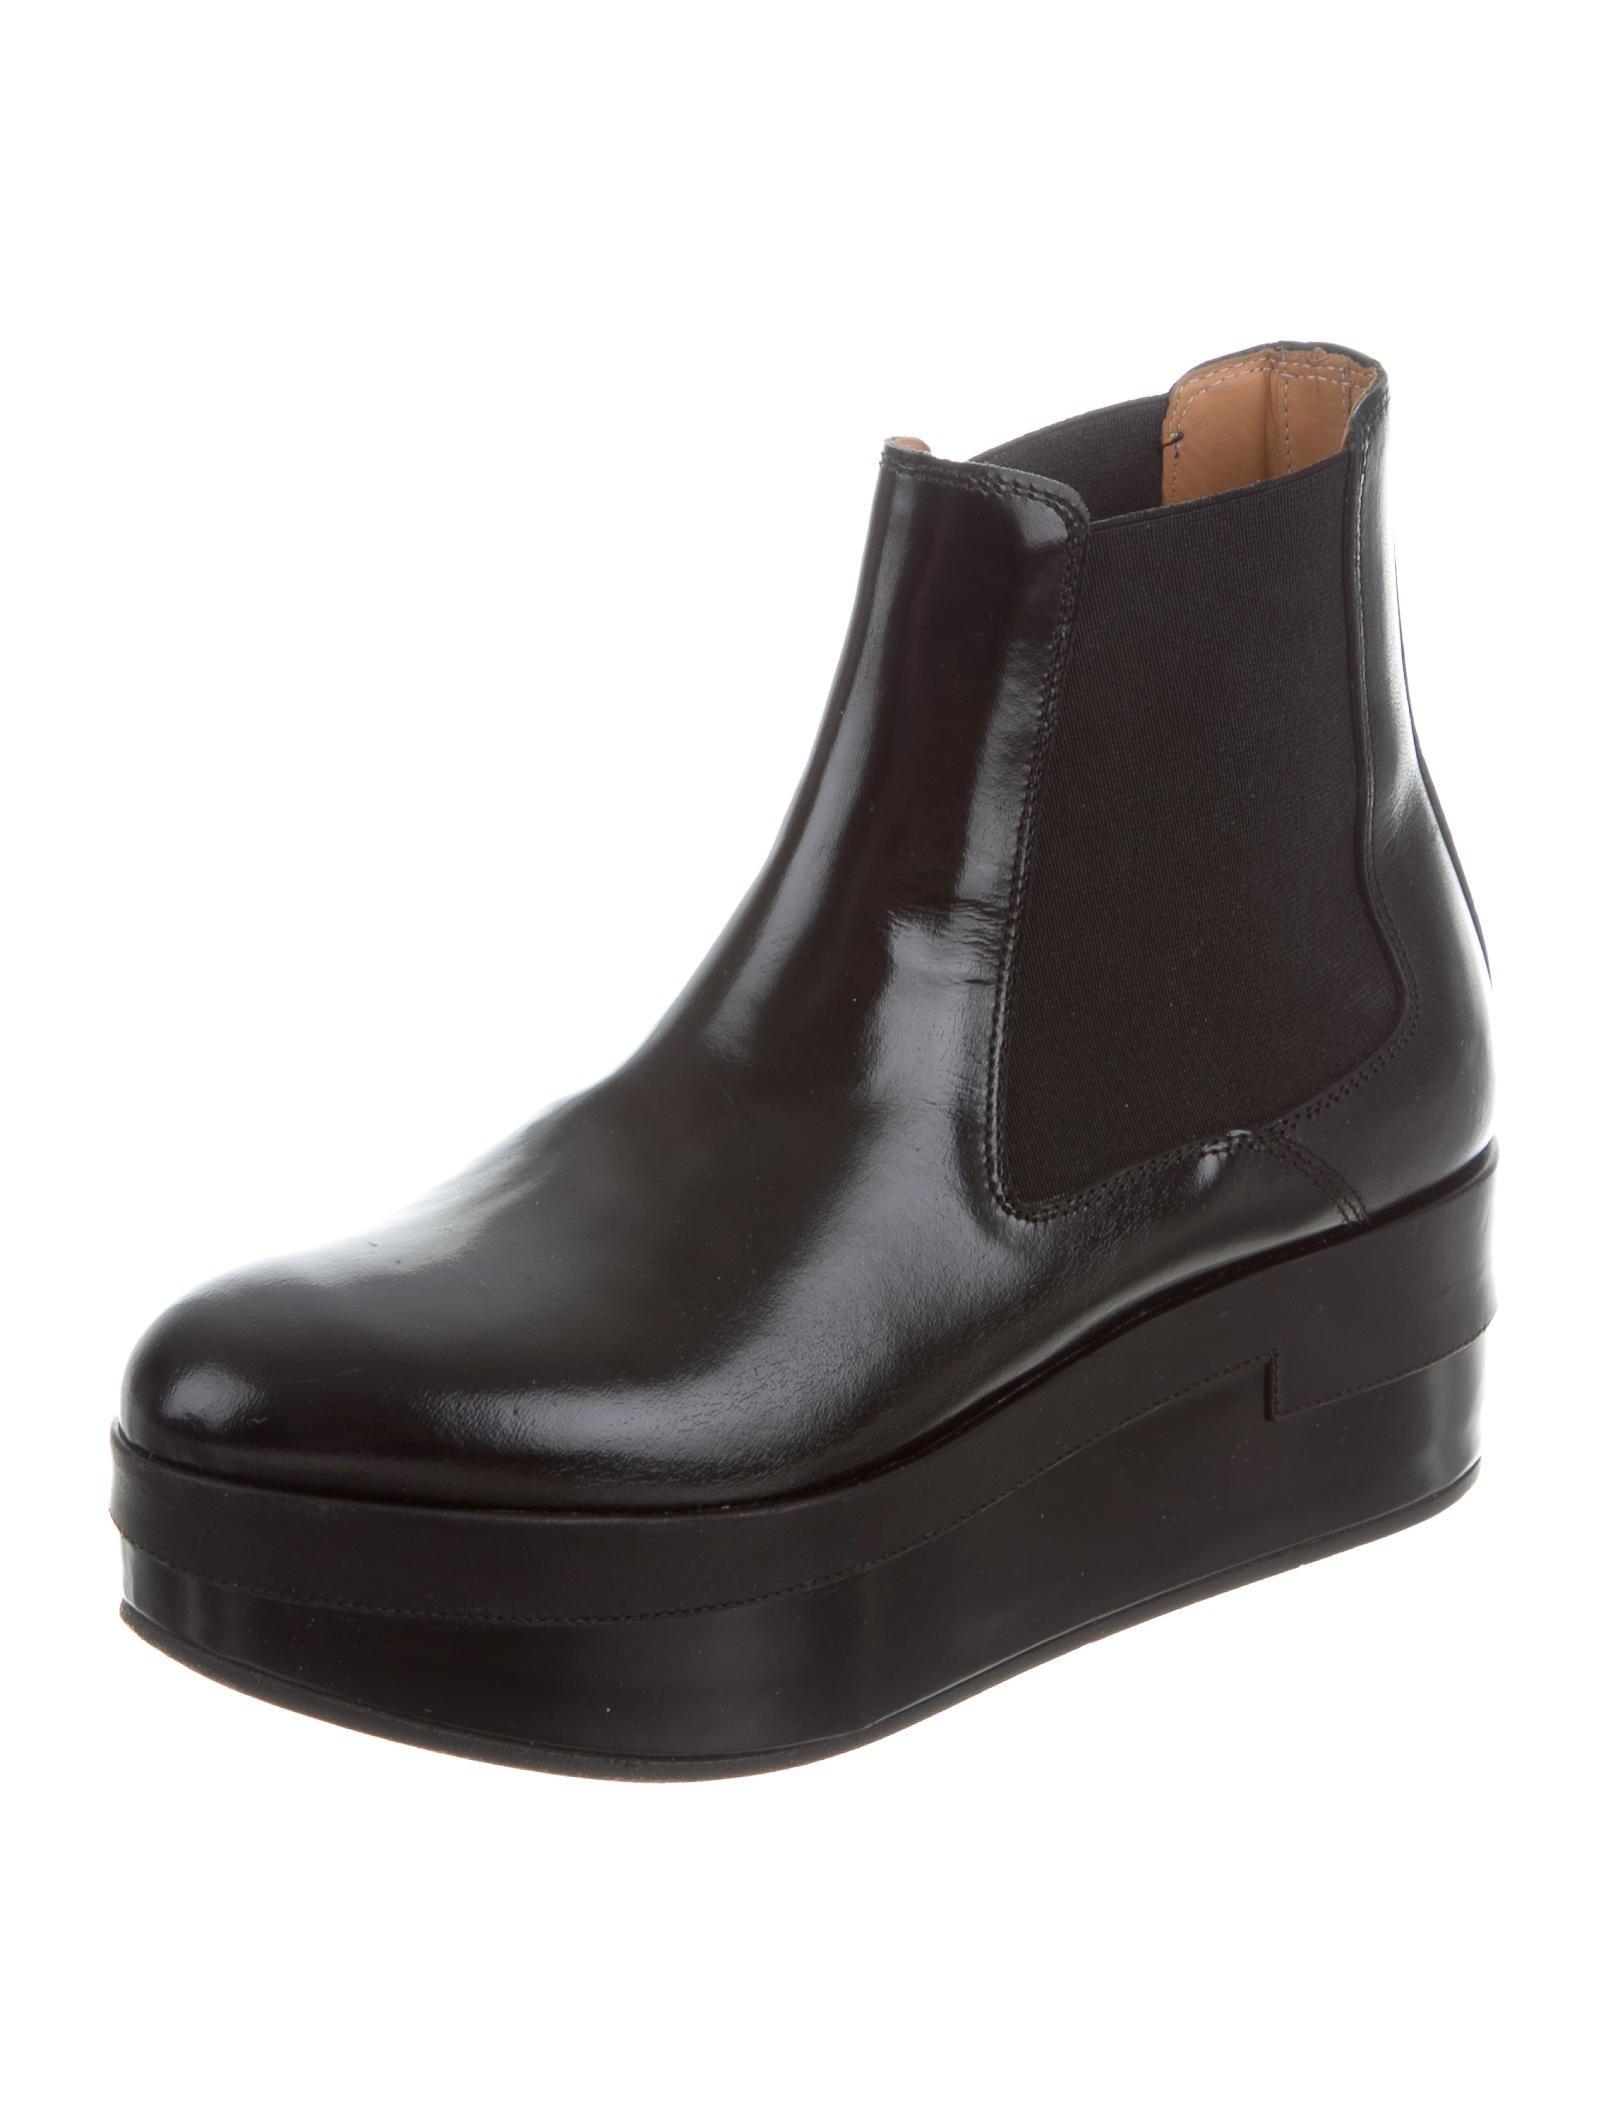 maison margiela leather platform boots shoes mai28561